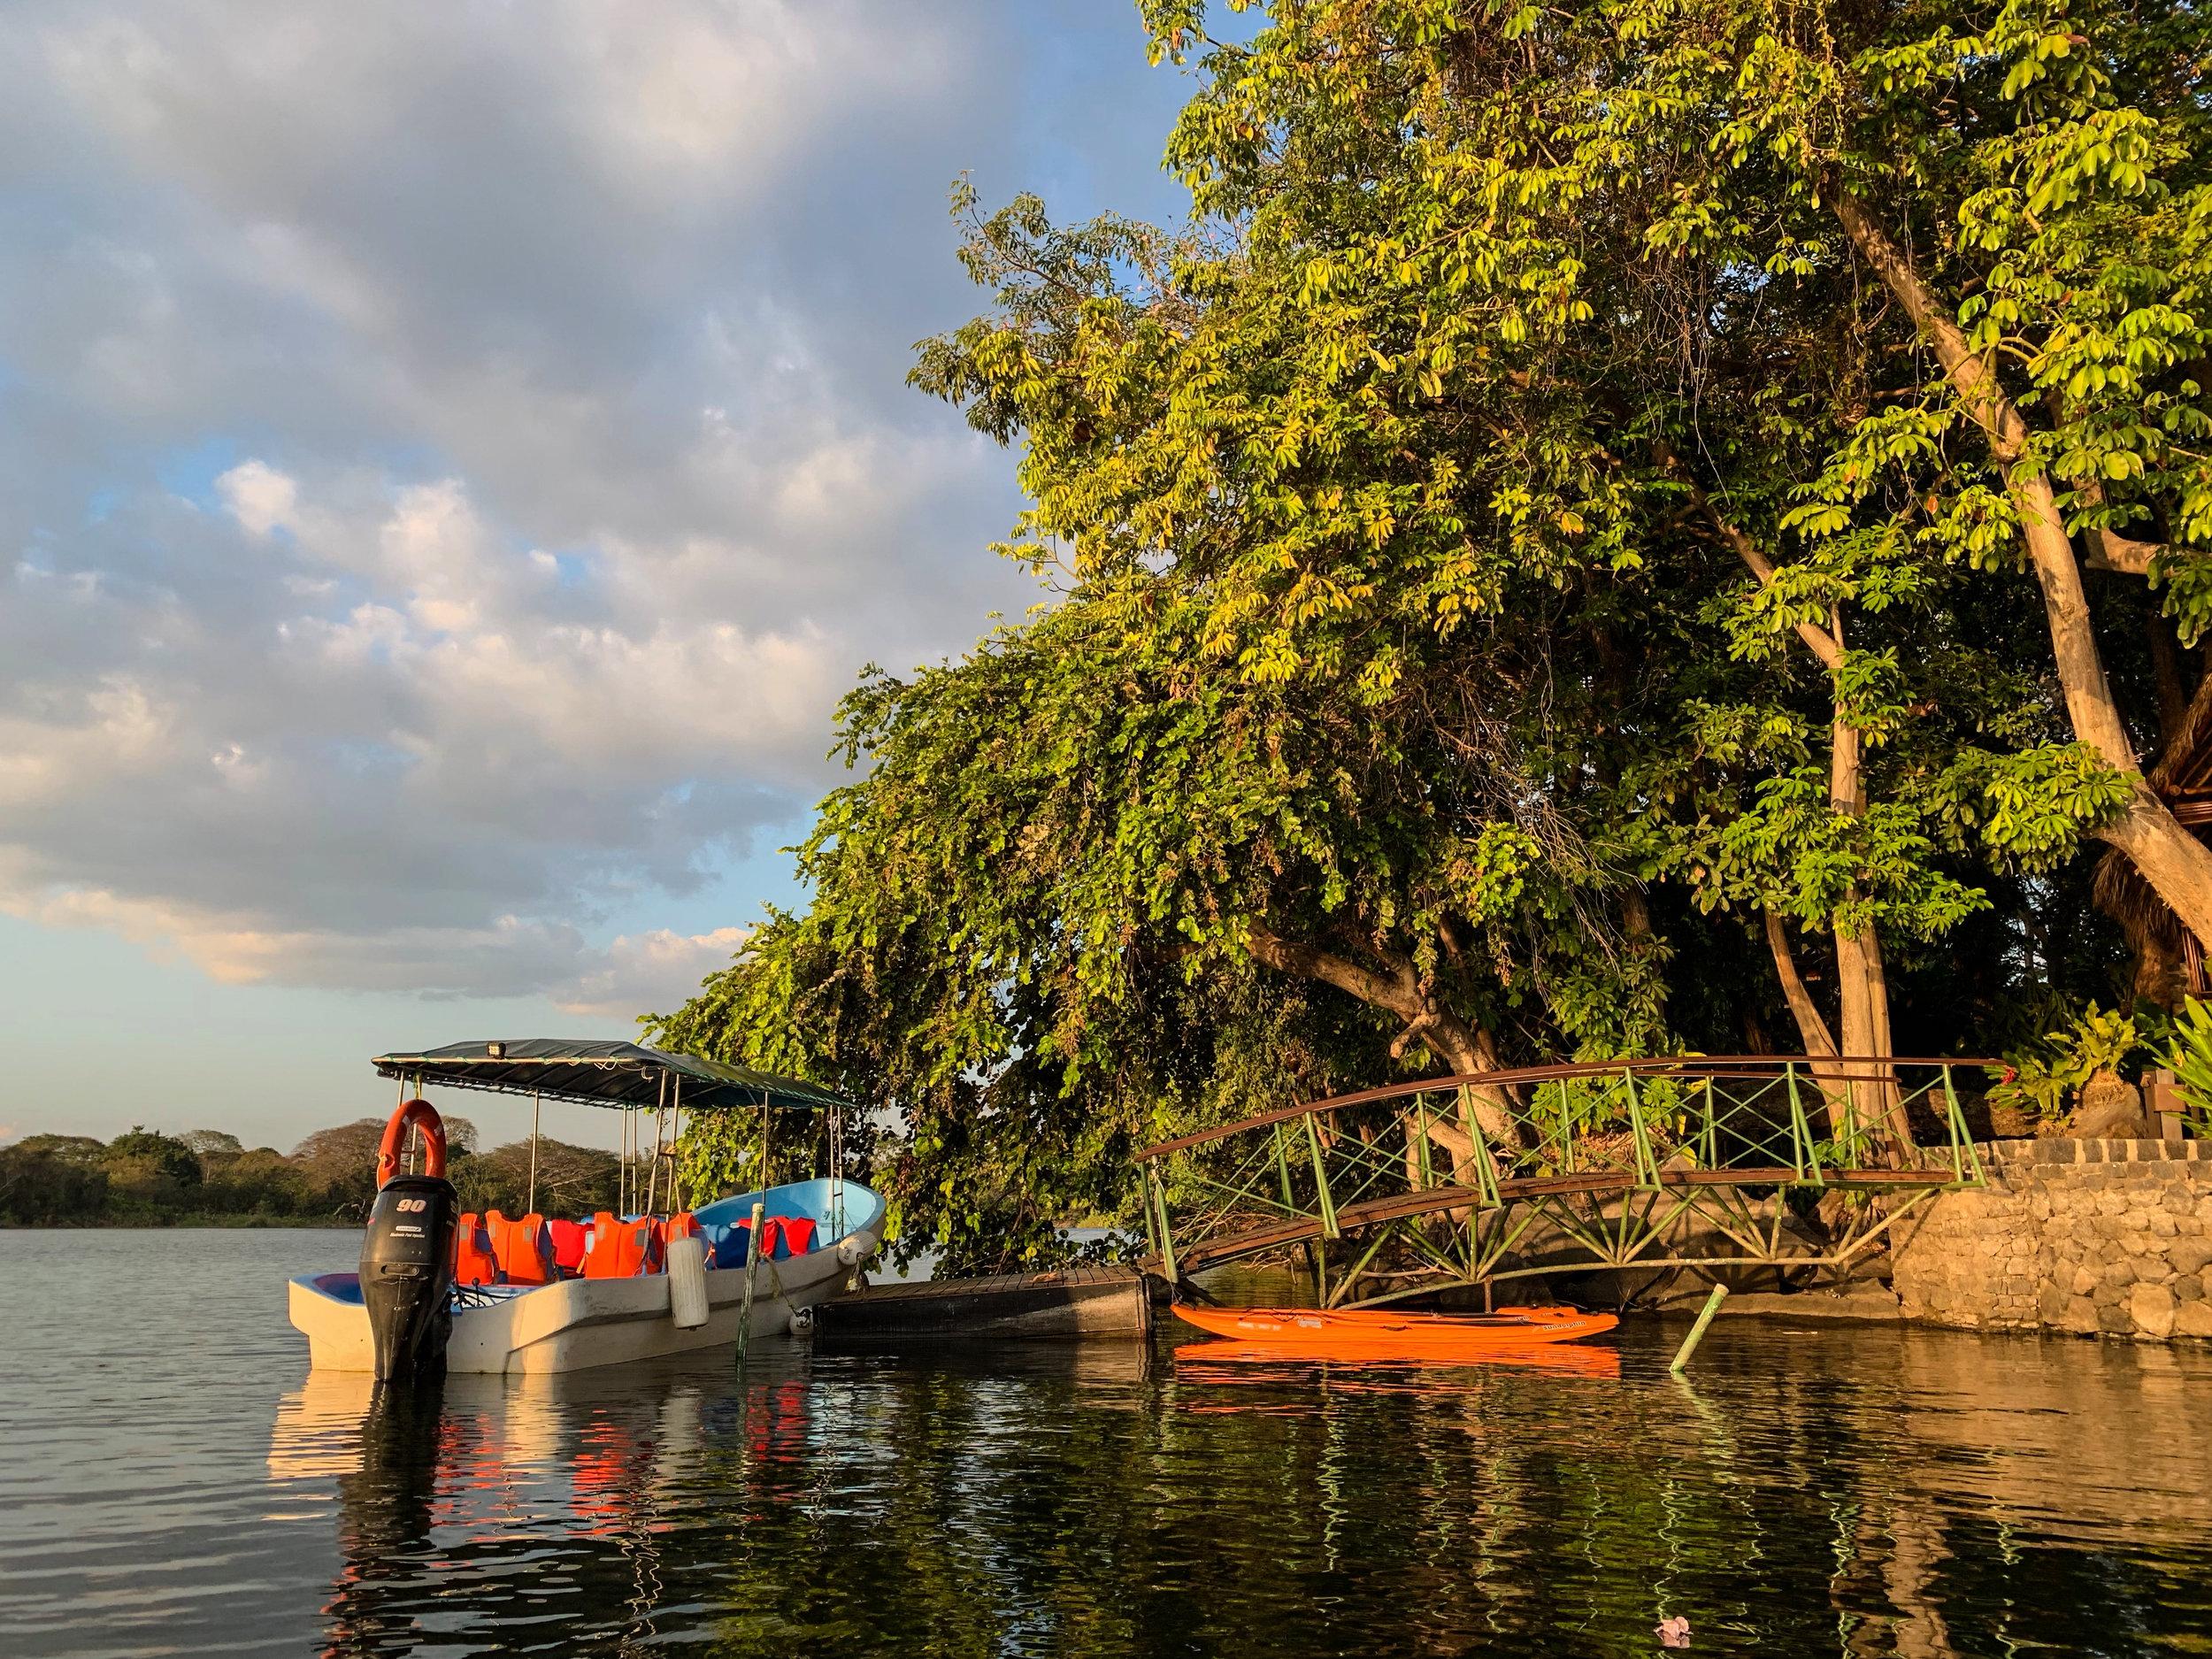 Dock and kayaks at Jicaro Island